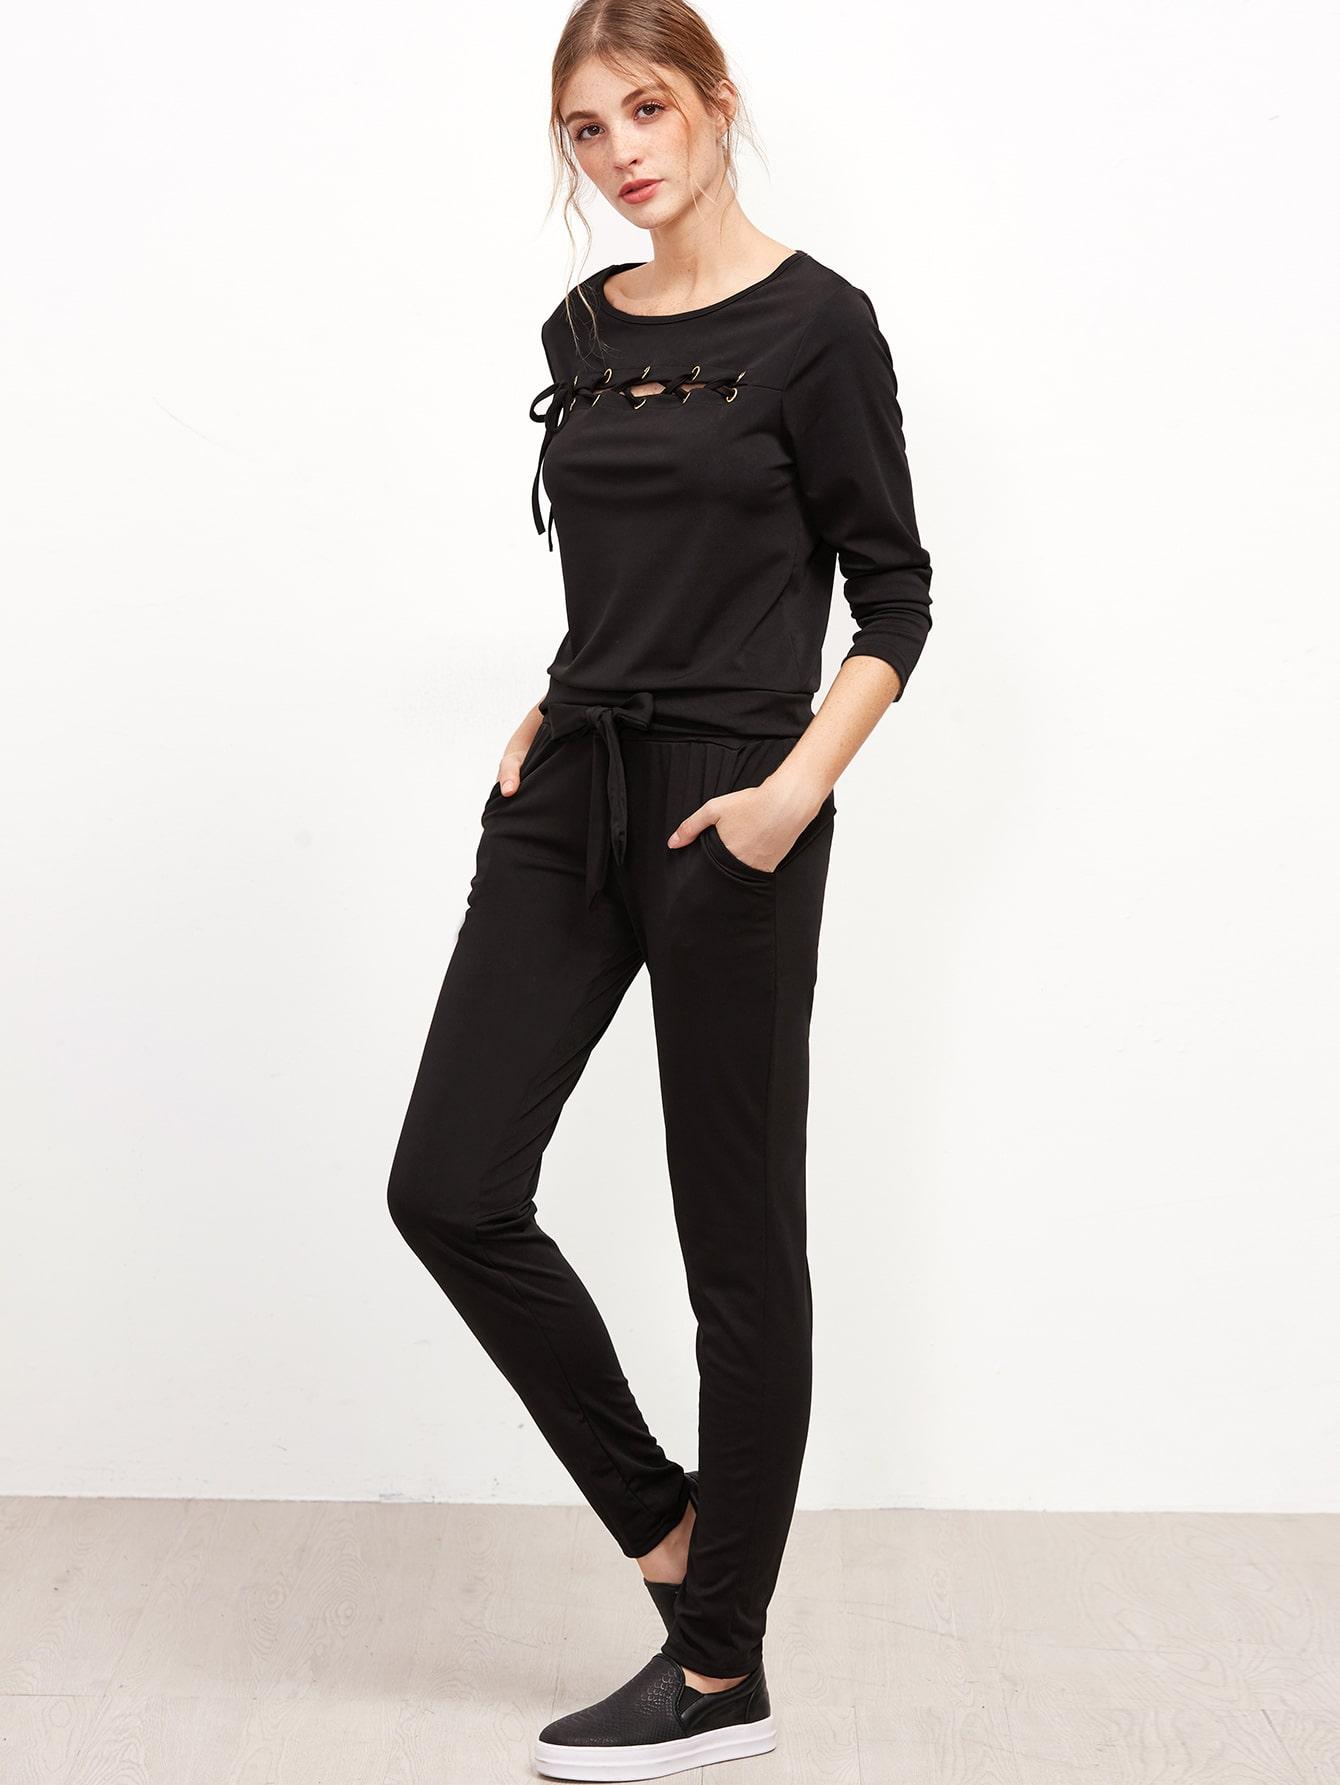 Black Eyelet Lace Up Trim Sweatshirt With Pants